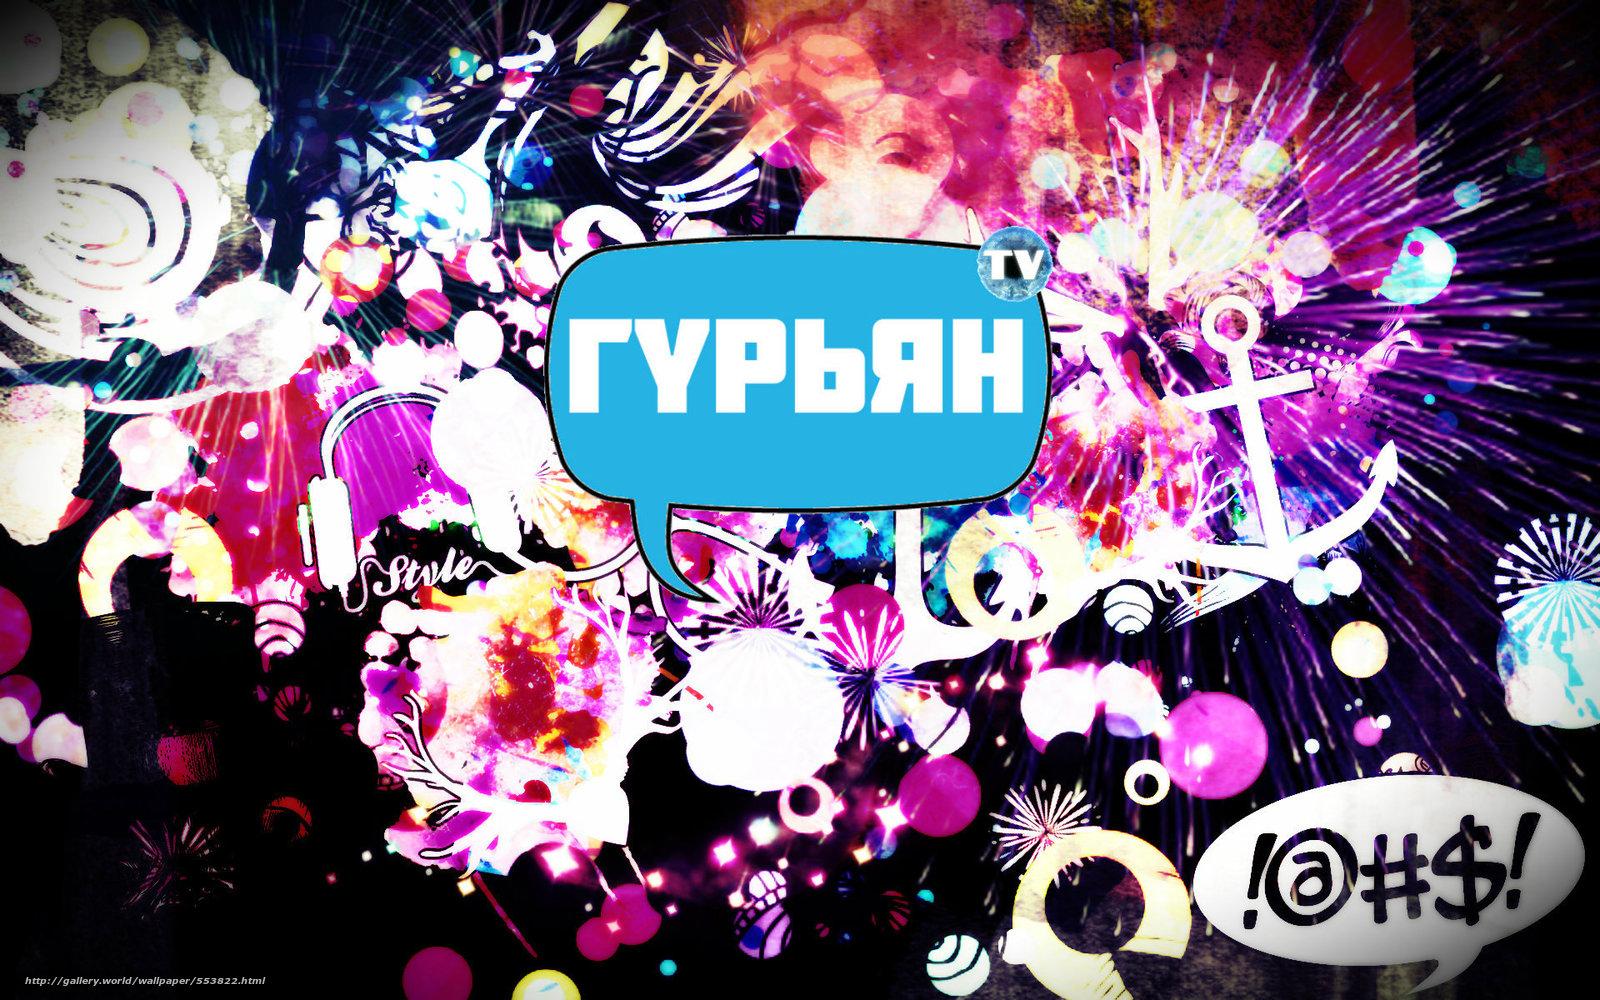 Tlcharger fond d 39 ecran rypb9ih youtube blogue gyryantv for Fond ecran youtube